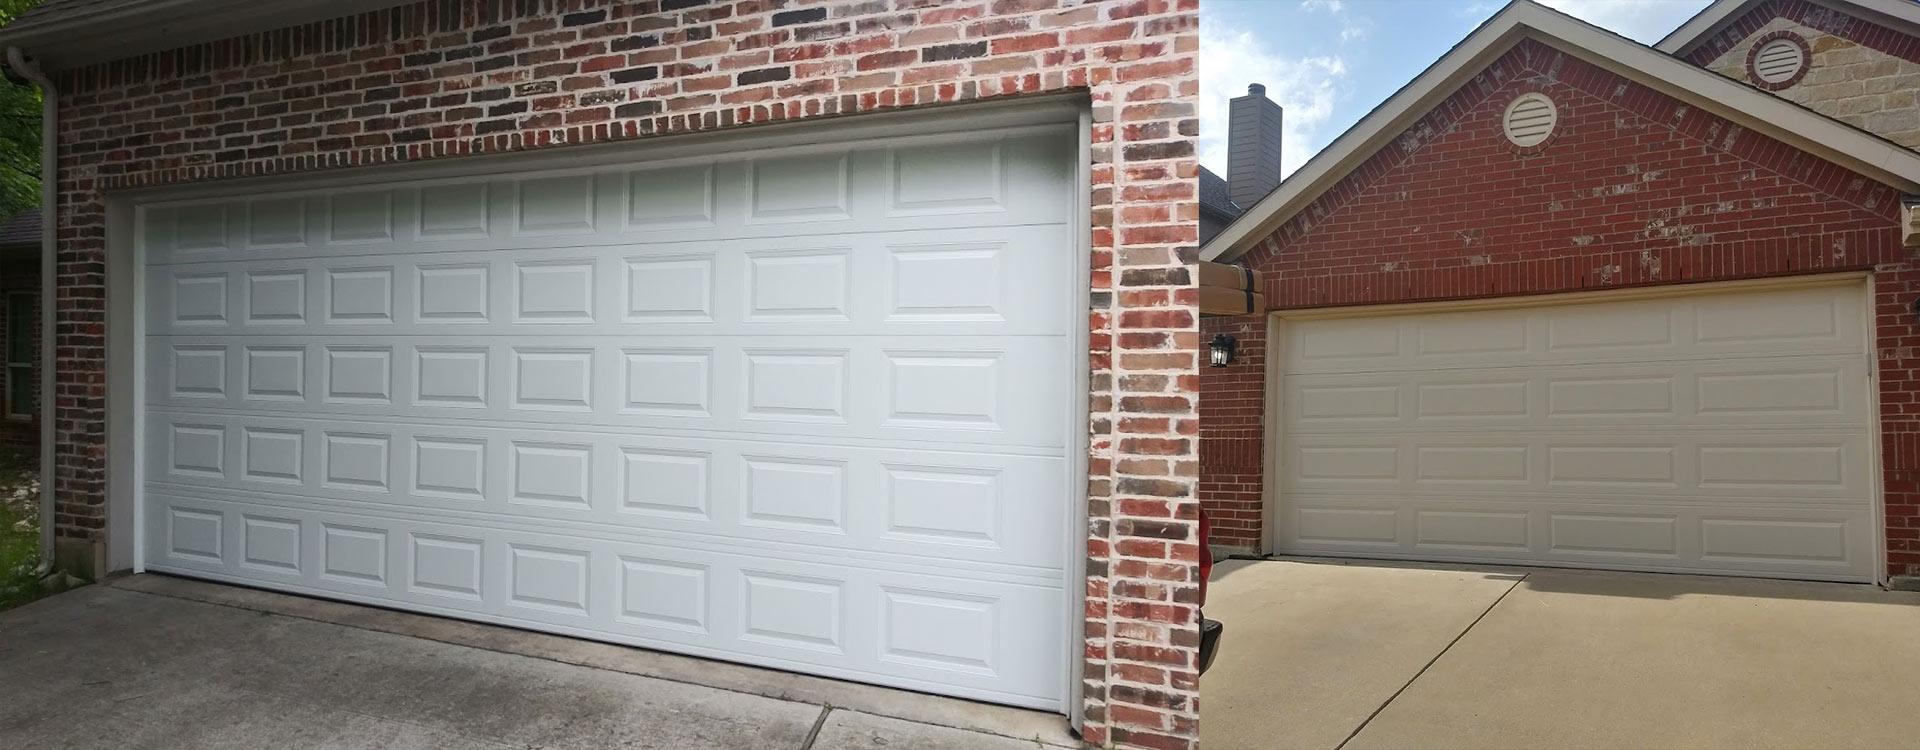 Steps to Finding the Perfect Garage Door Repair Service